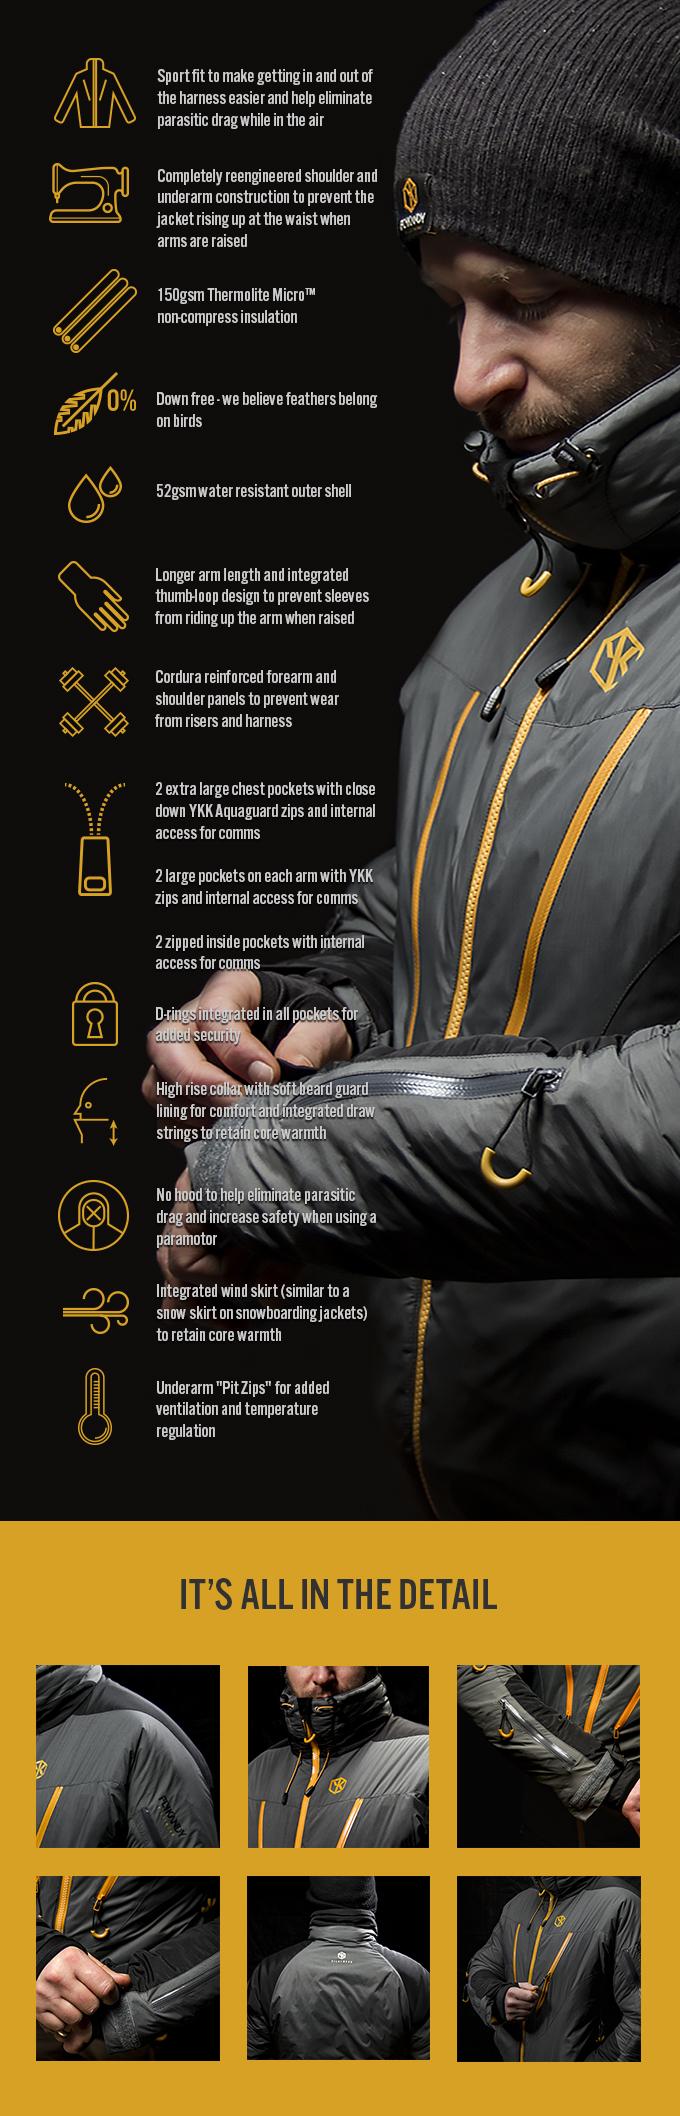 Flykandy_infographic2.jpg